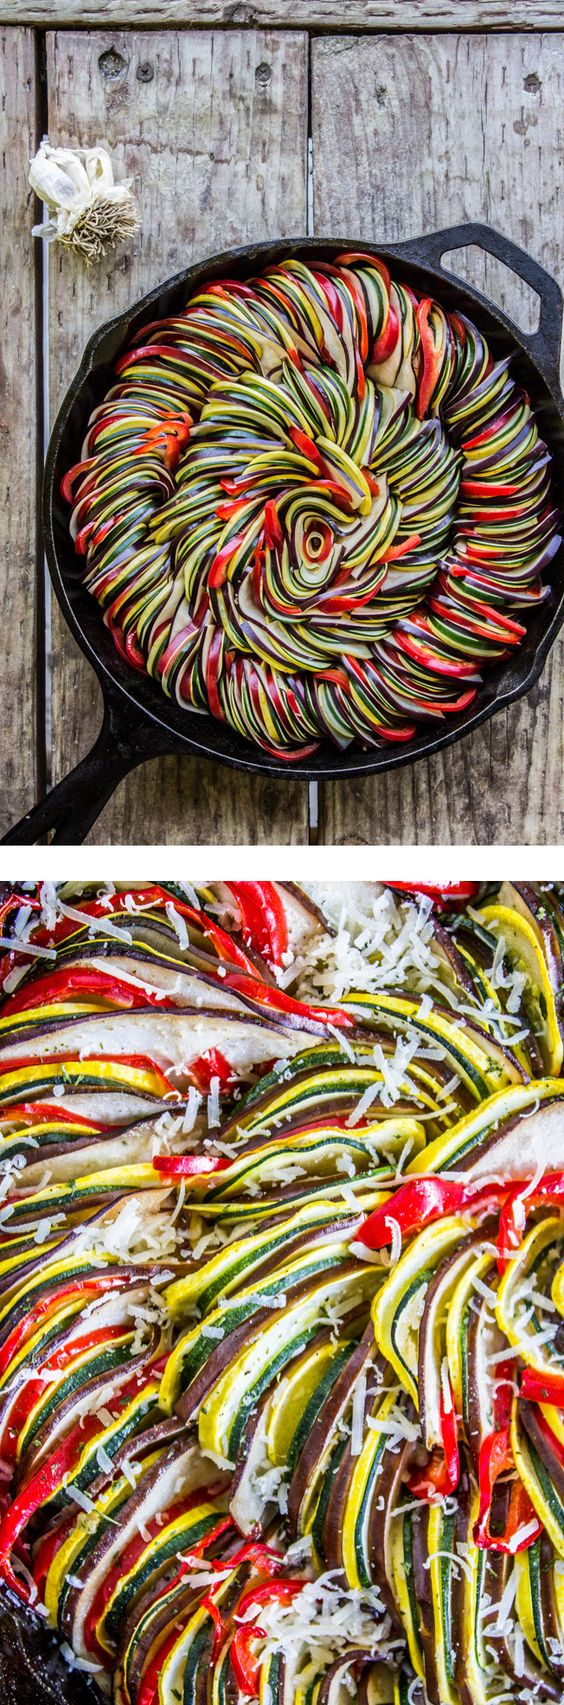 Roasted Garlic Ratatouille by thefoodcharlatan #Ratatouille #Garlic